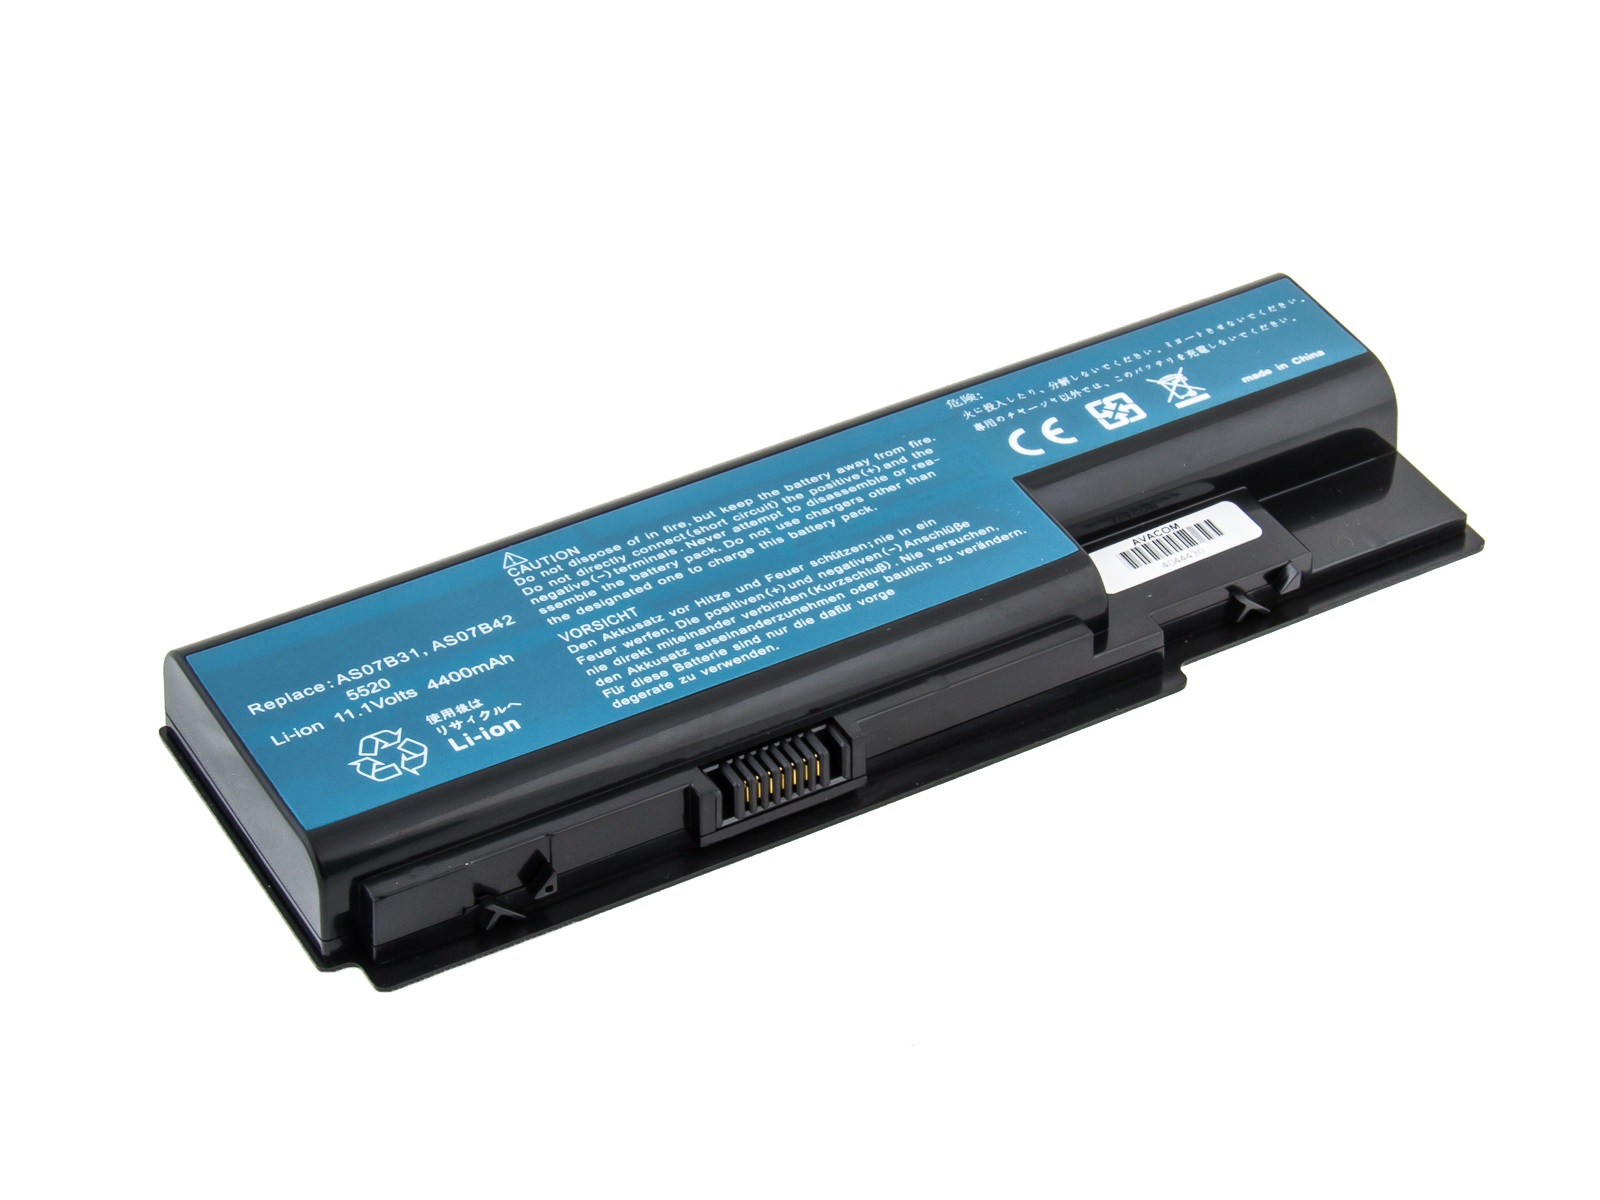 Baterie AVACOM NOAC-6920-N22 pro Acer Aspire 5520/6920 Li-Ion 10,8V 4400mAh, NOAC-6920-N22